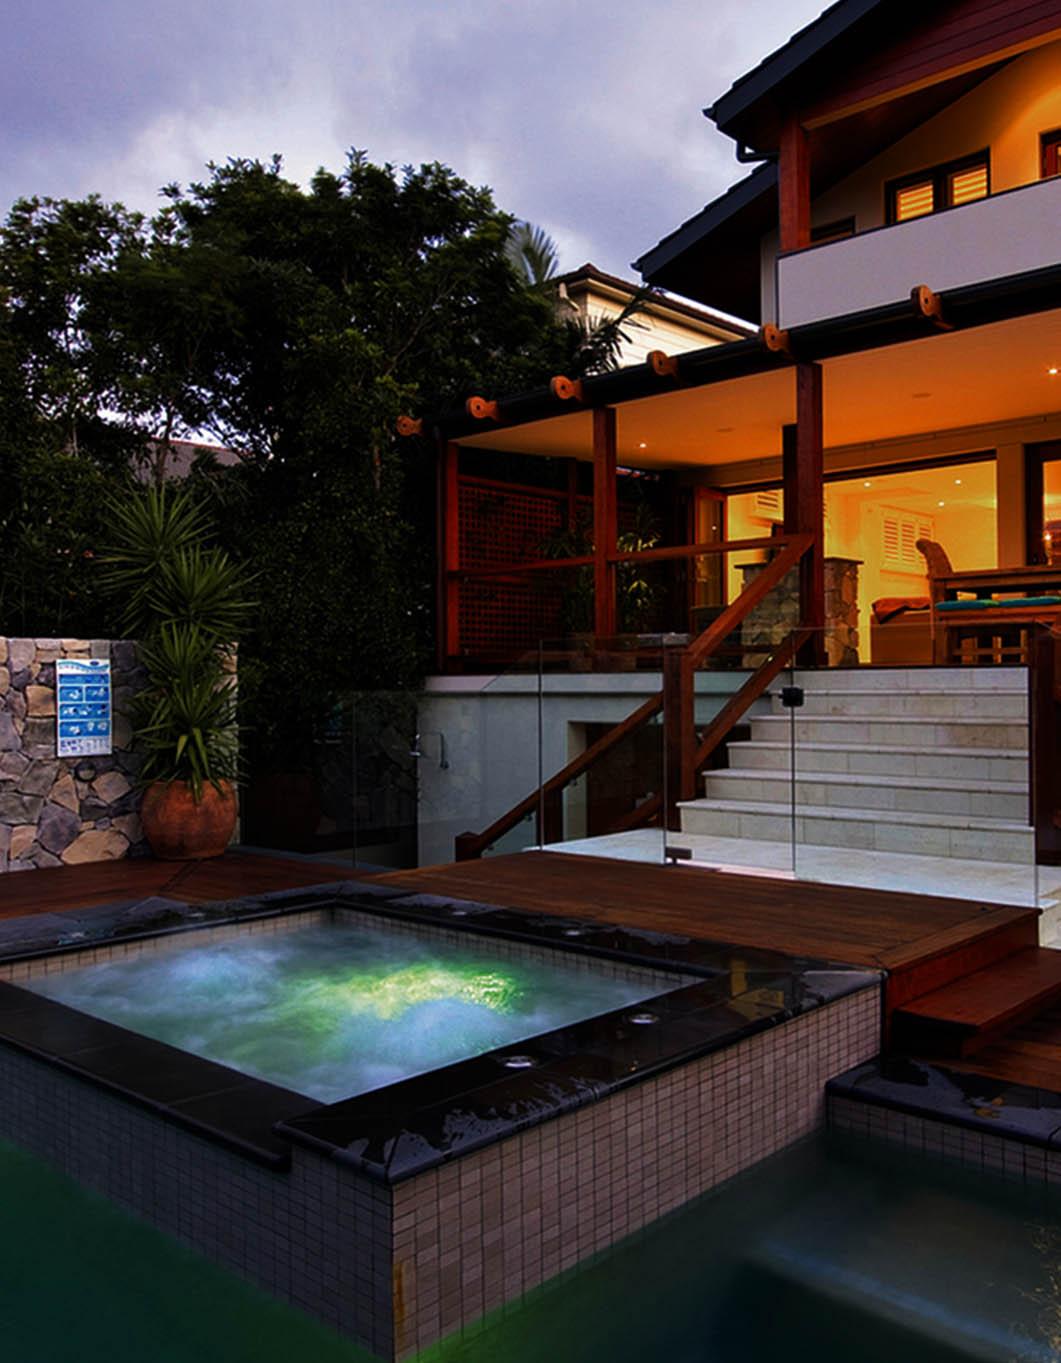 chauffage-piscine-et-spas